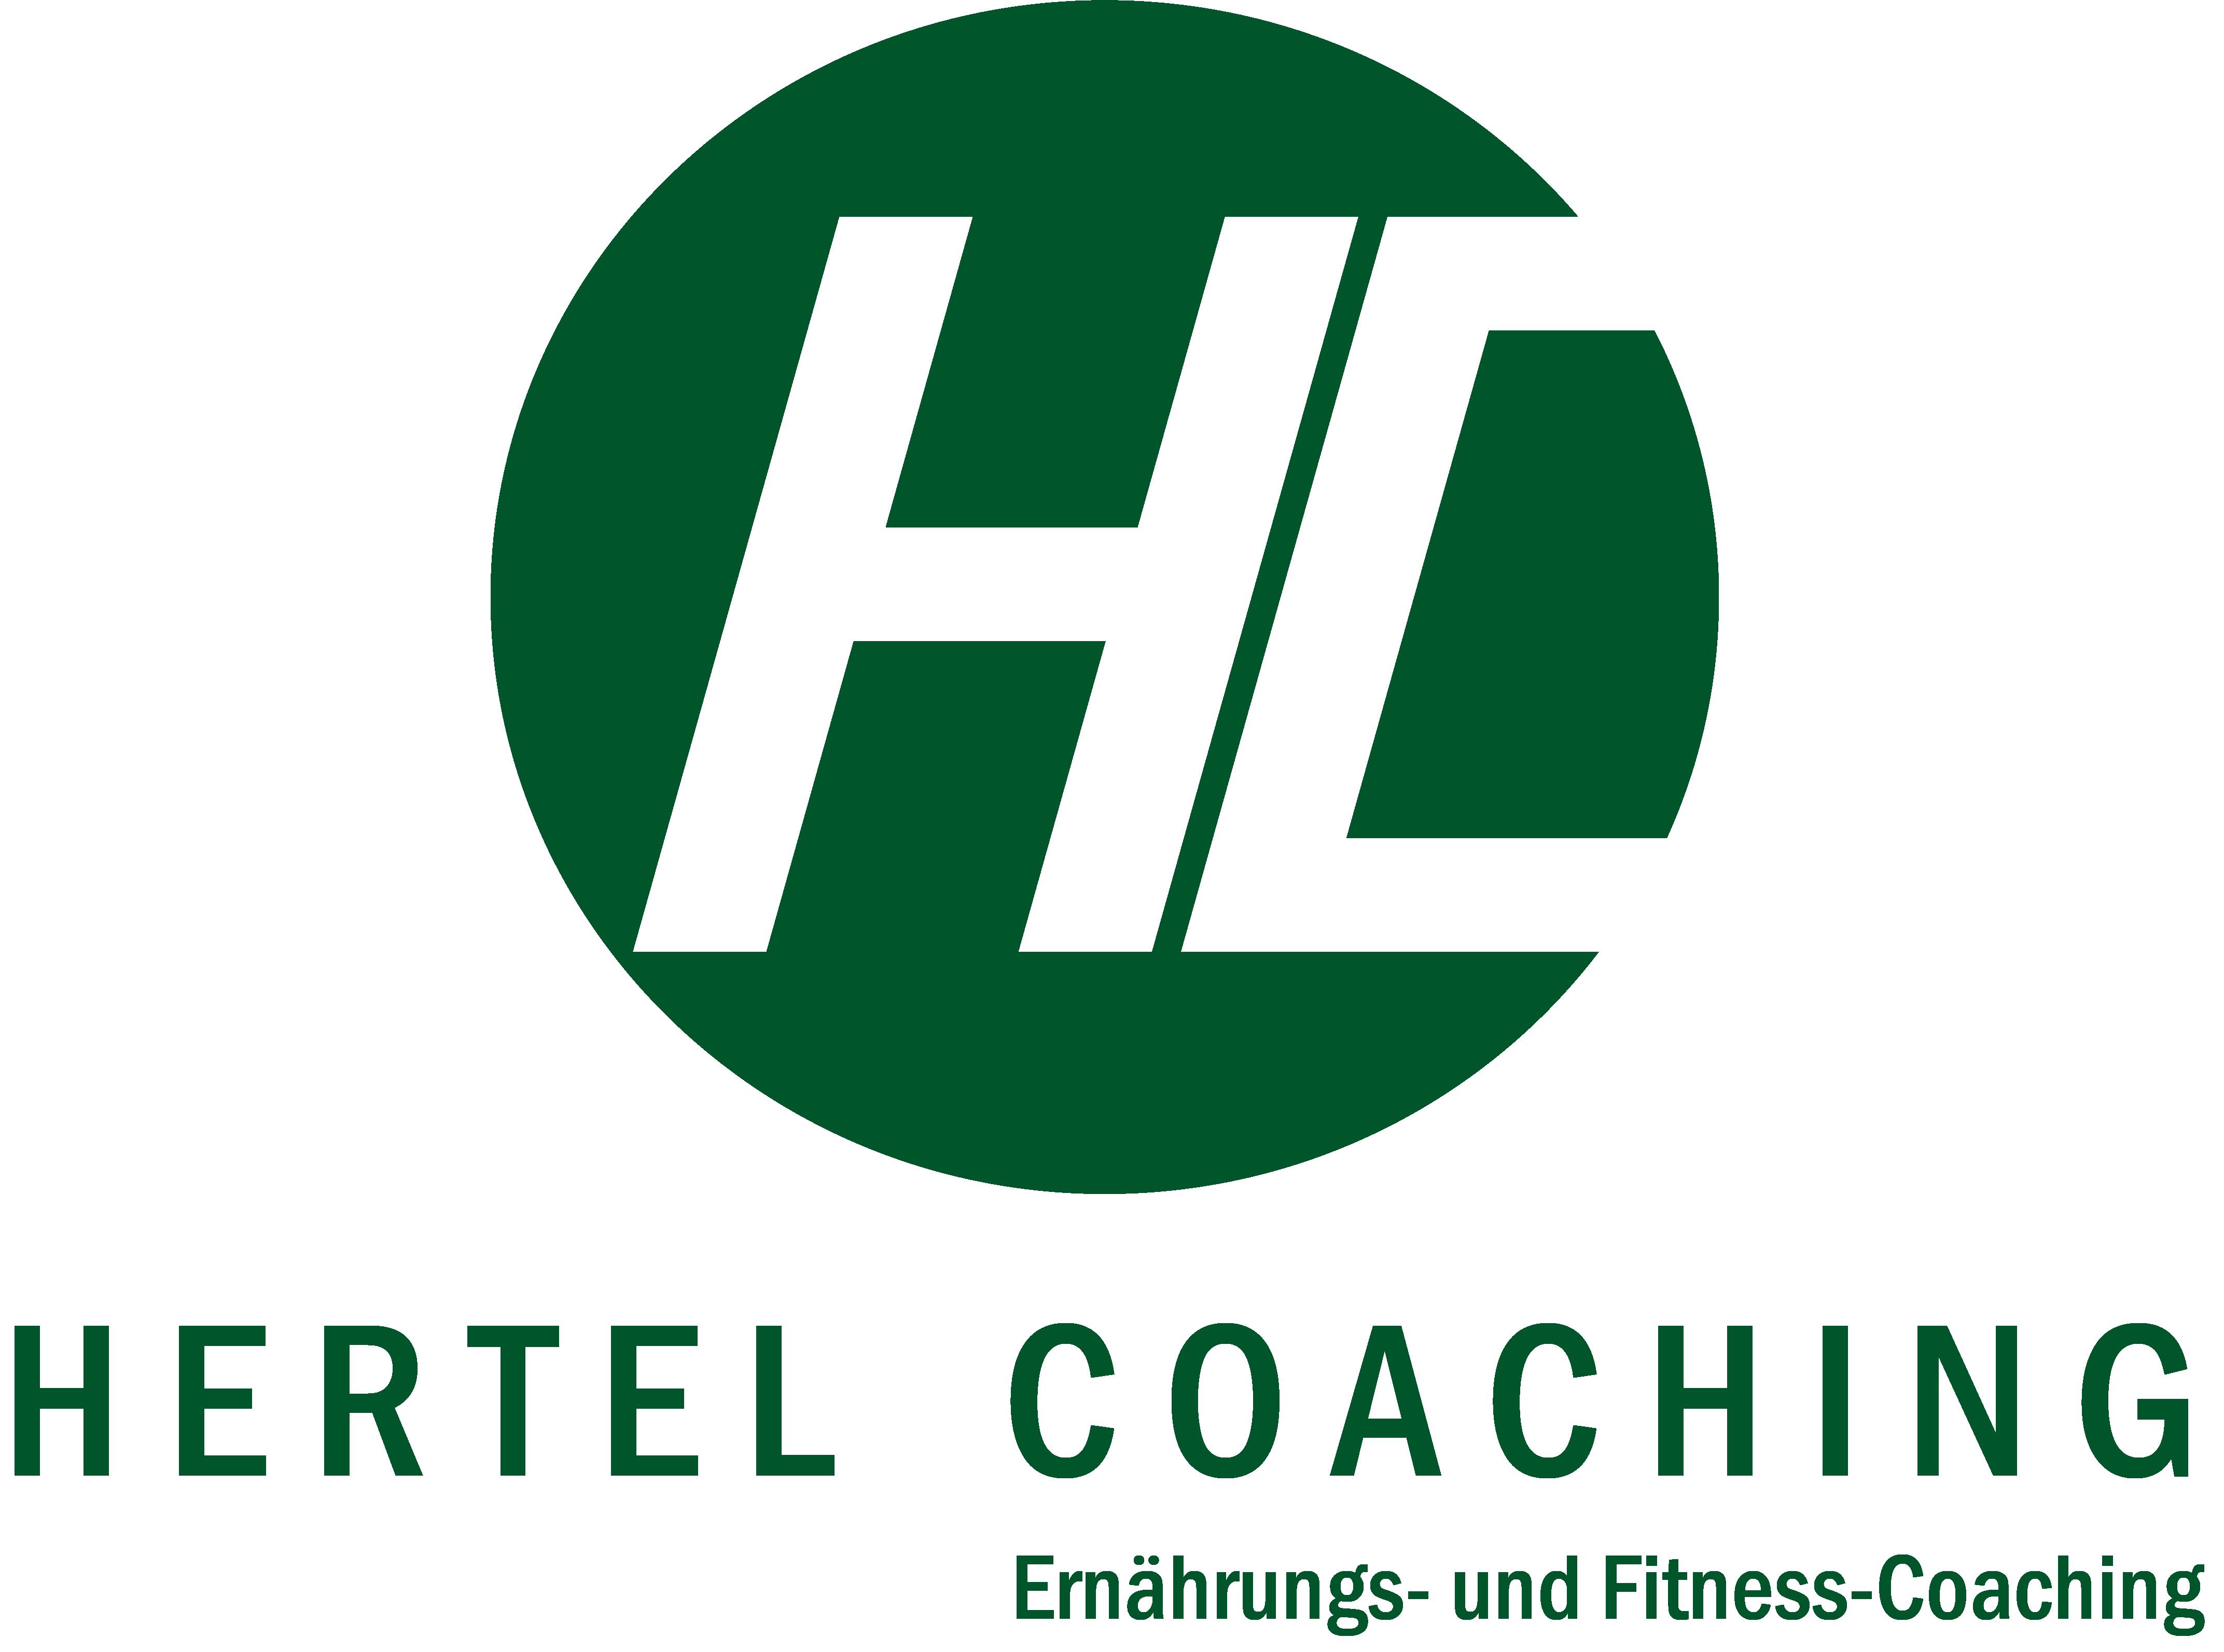 Hertel Coaching - Ernährungs- und Fitness Coaching